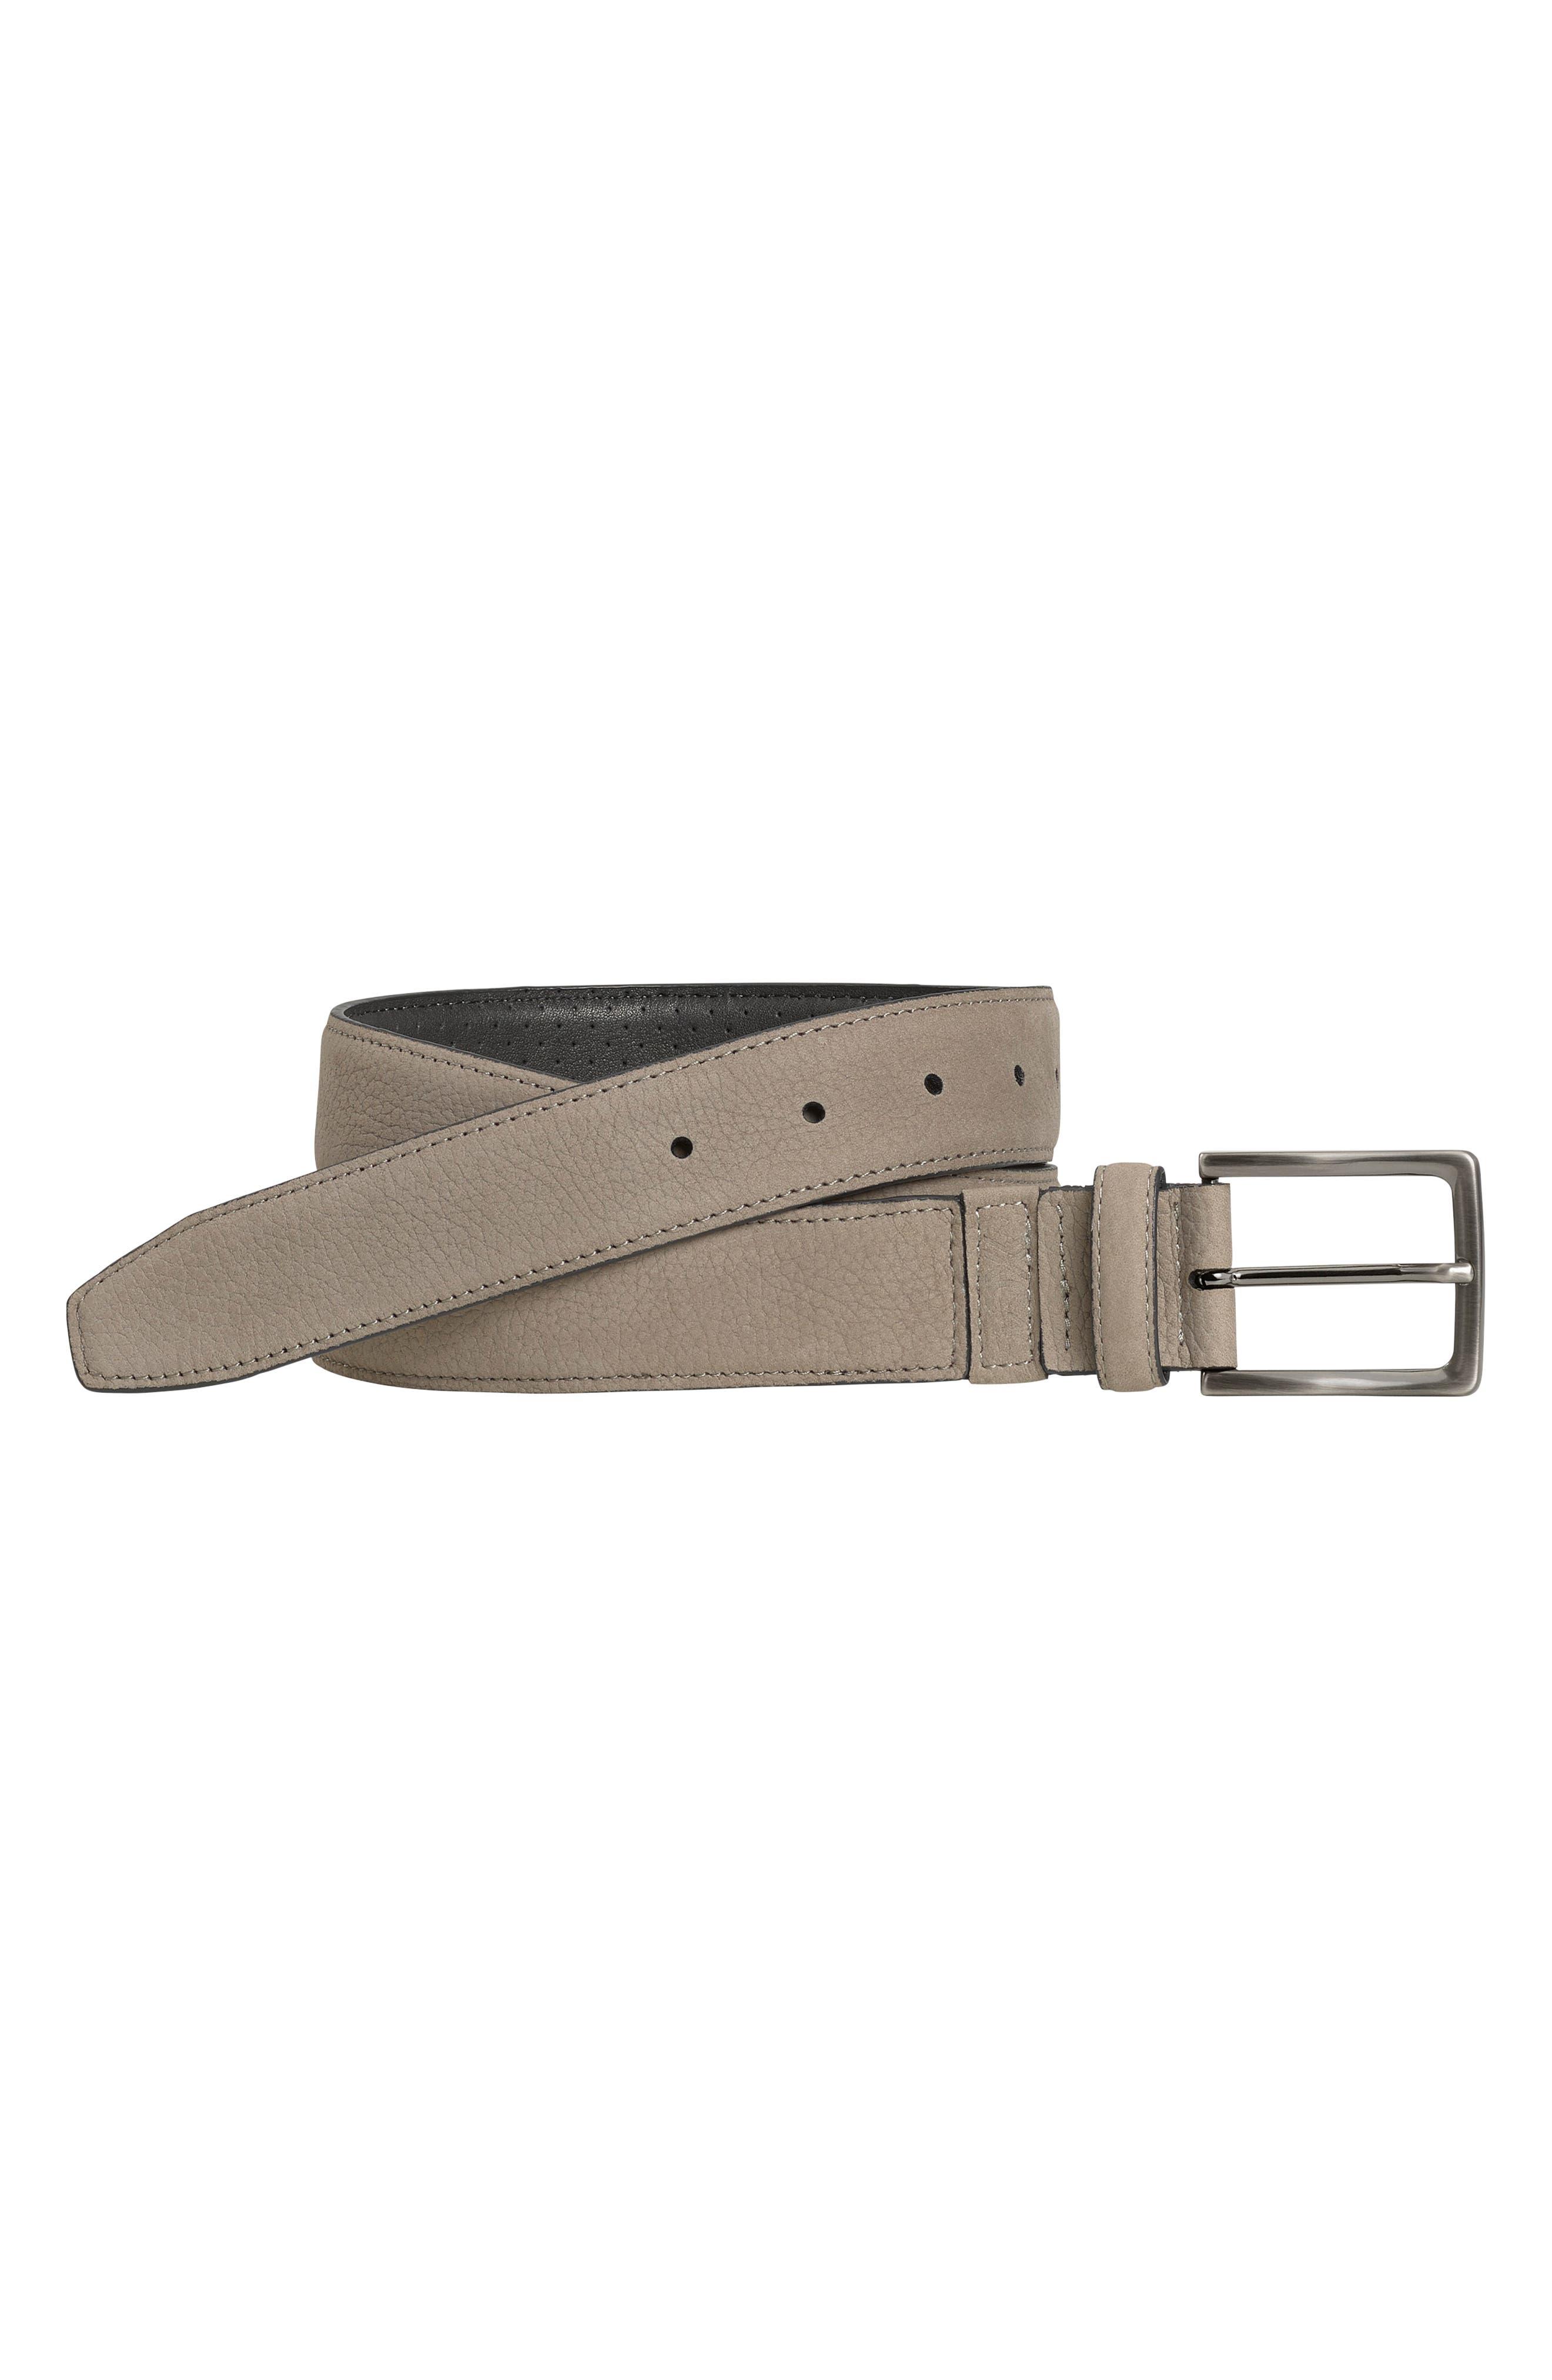 Xc4 Leather Dress Belt